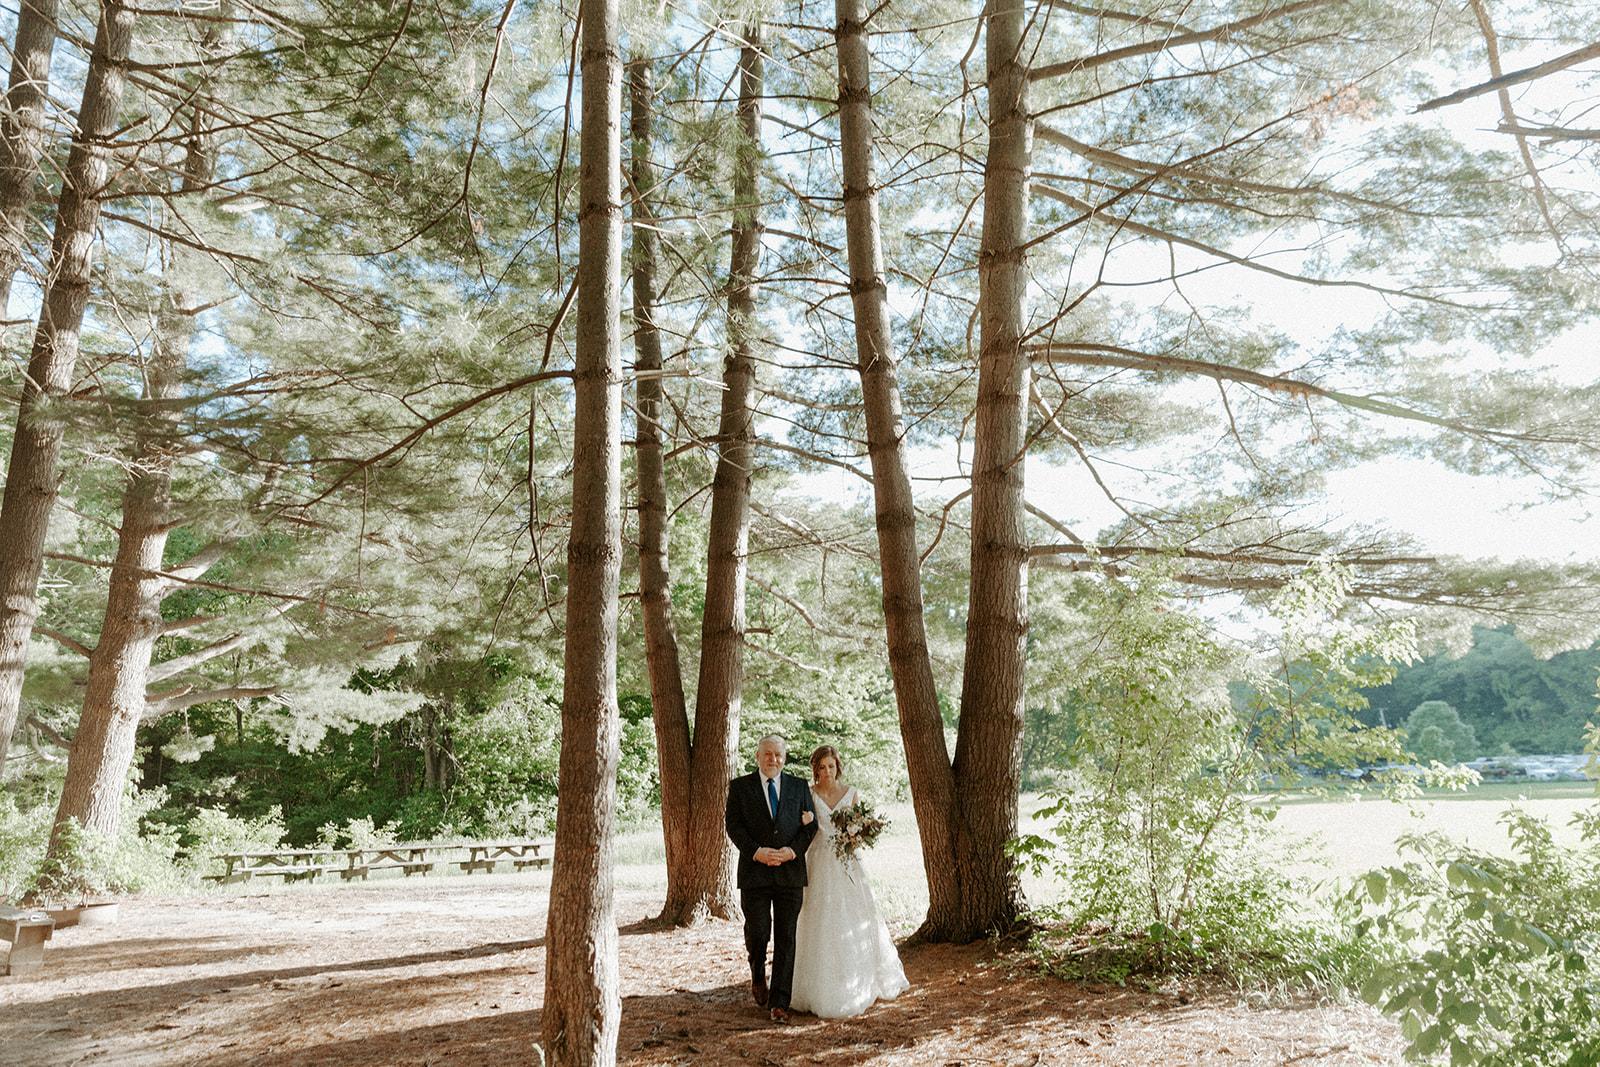 camp_wokanda_peoria_illinois_wedding_photographer_wright_photographs_bliese_0196.jpg